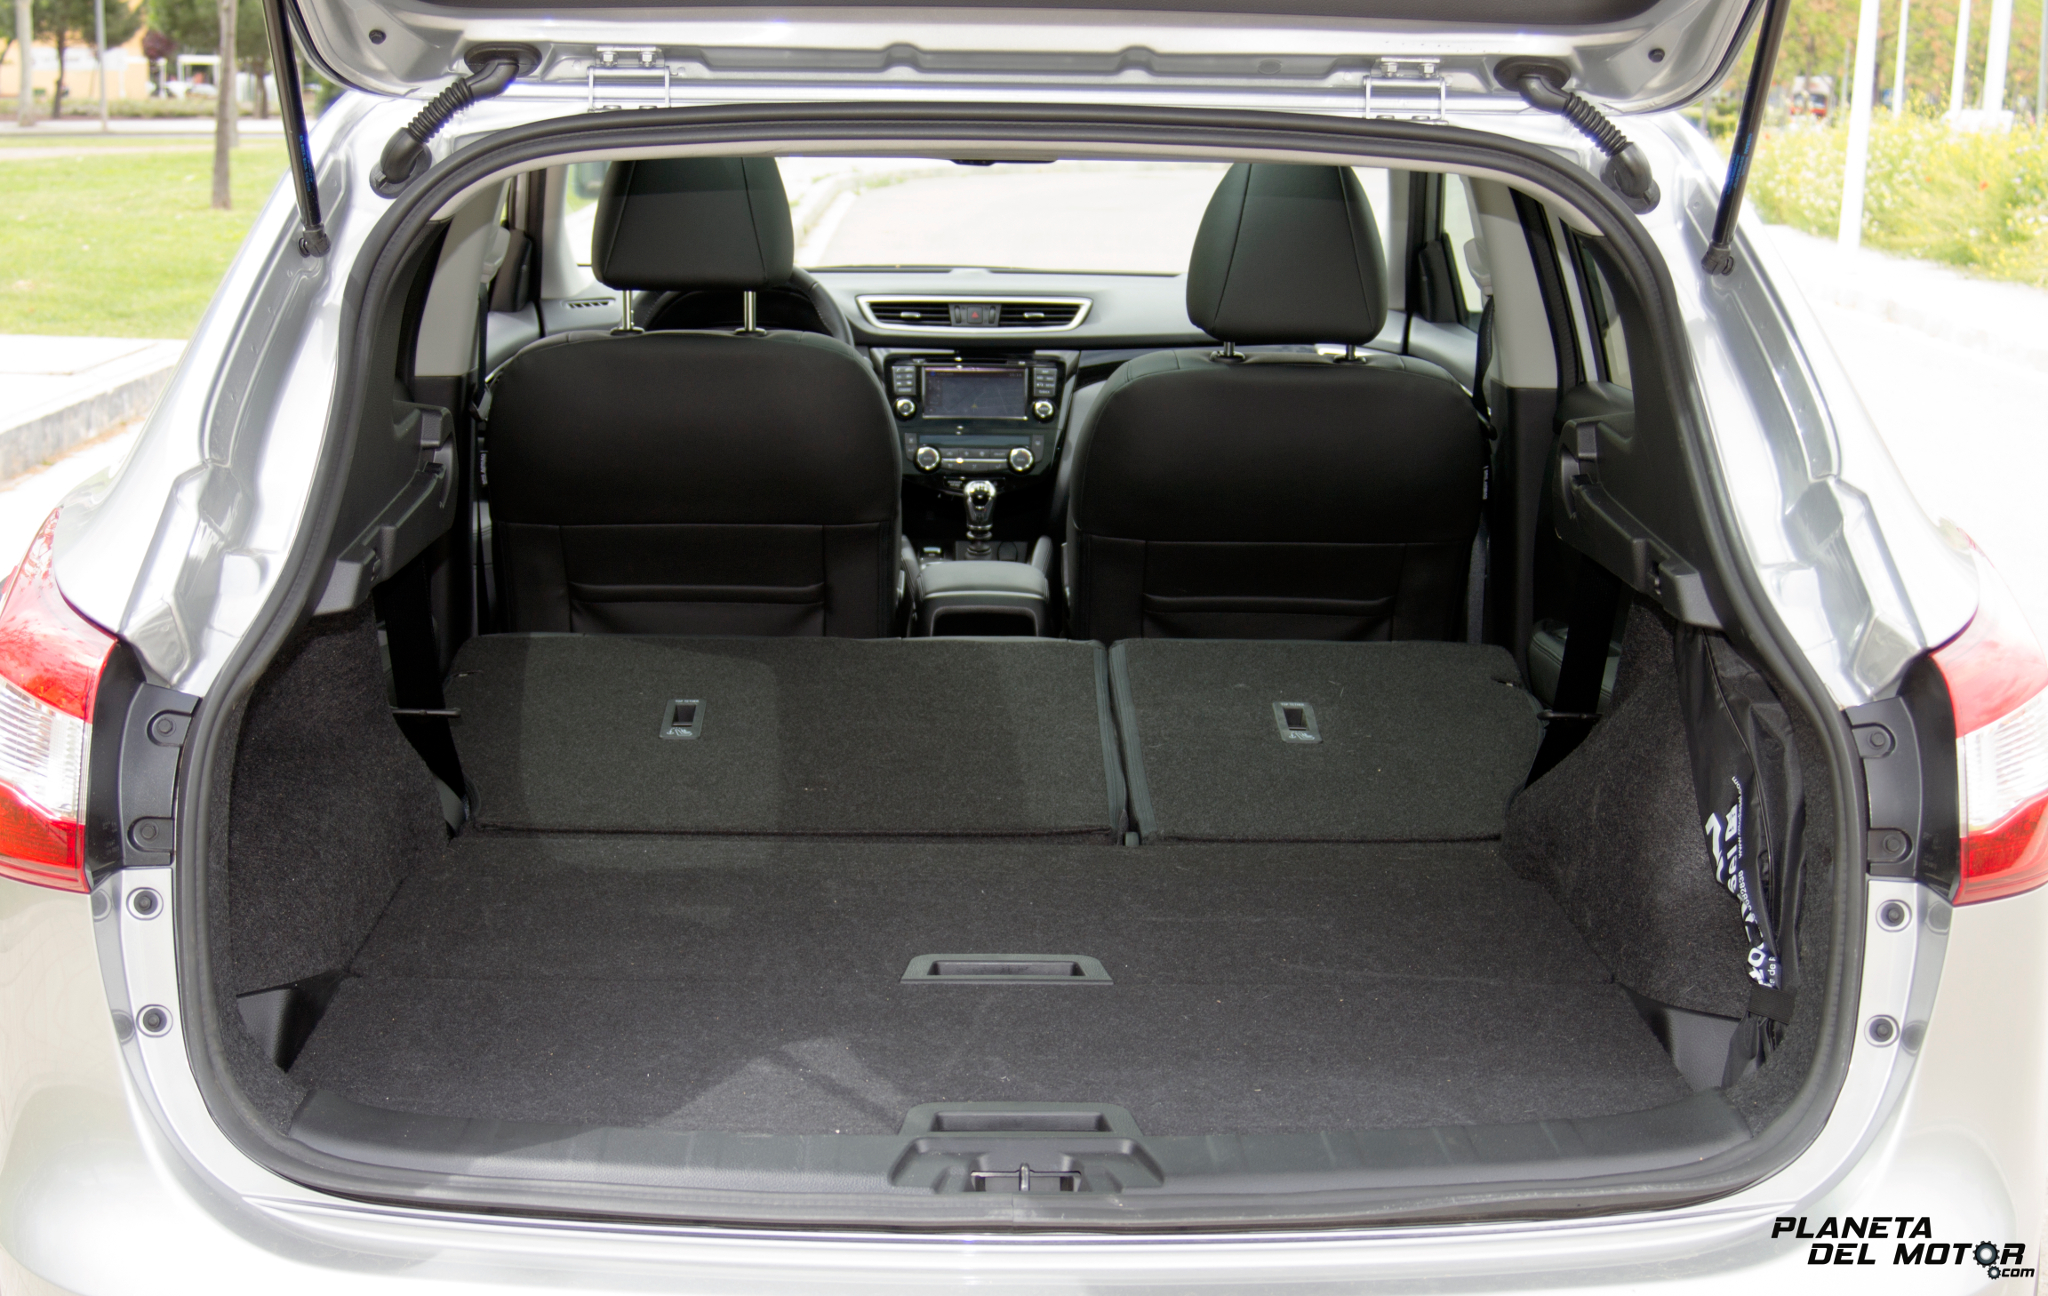 prueba_Nissan Qashqai 1.2 DIG-T Tekna_asientos abatidos